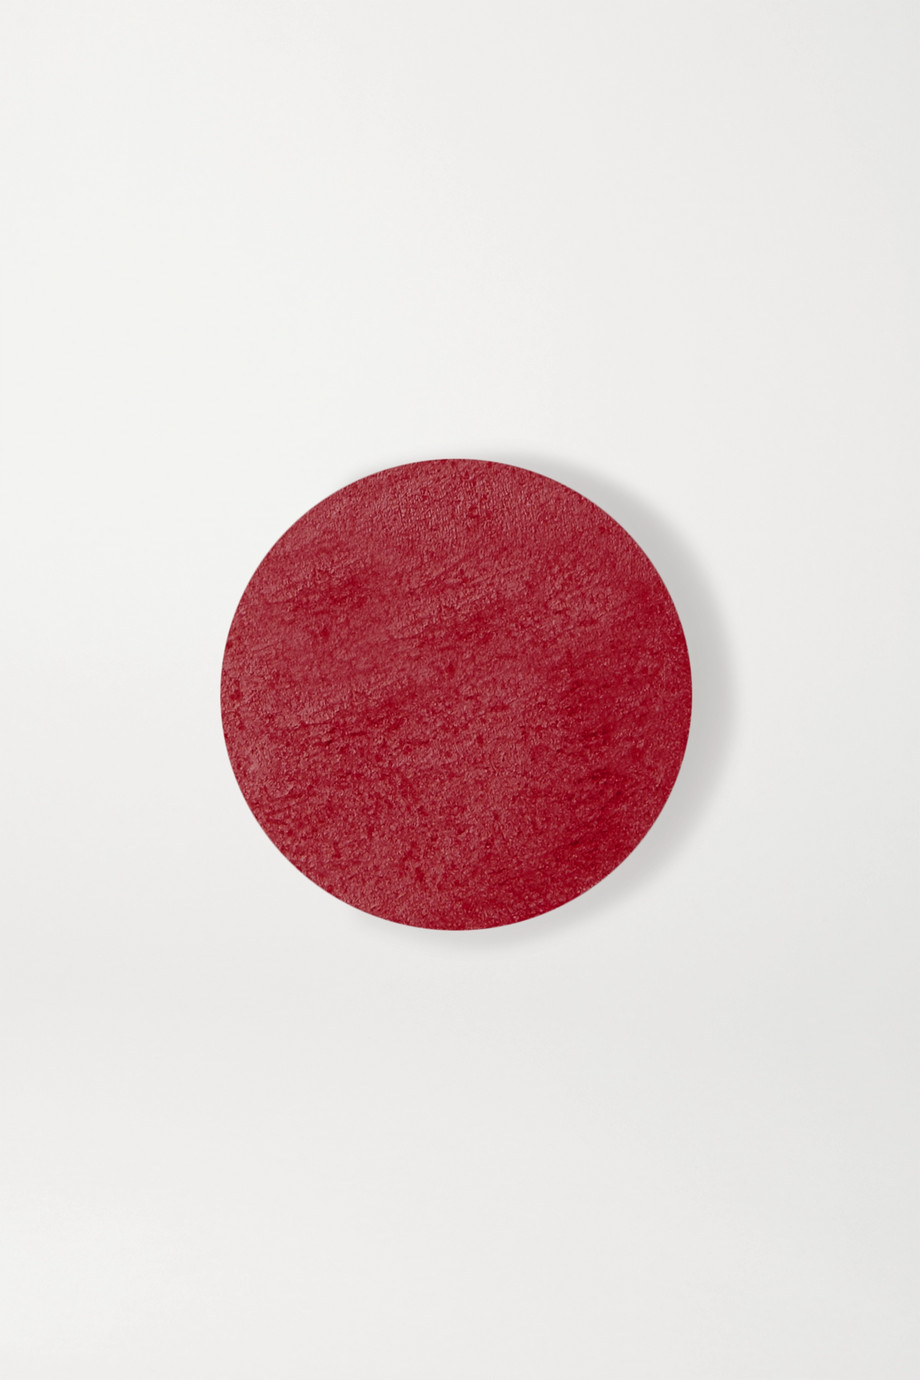 La Bouche Rouge Satin Lipstick Refill - Le Rouge Anja